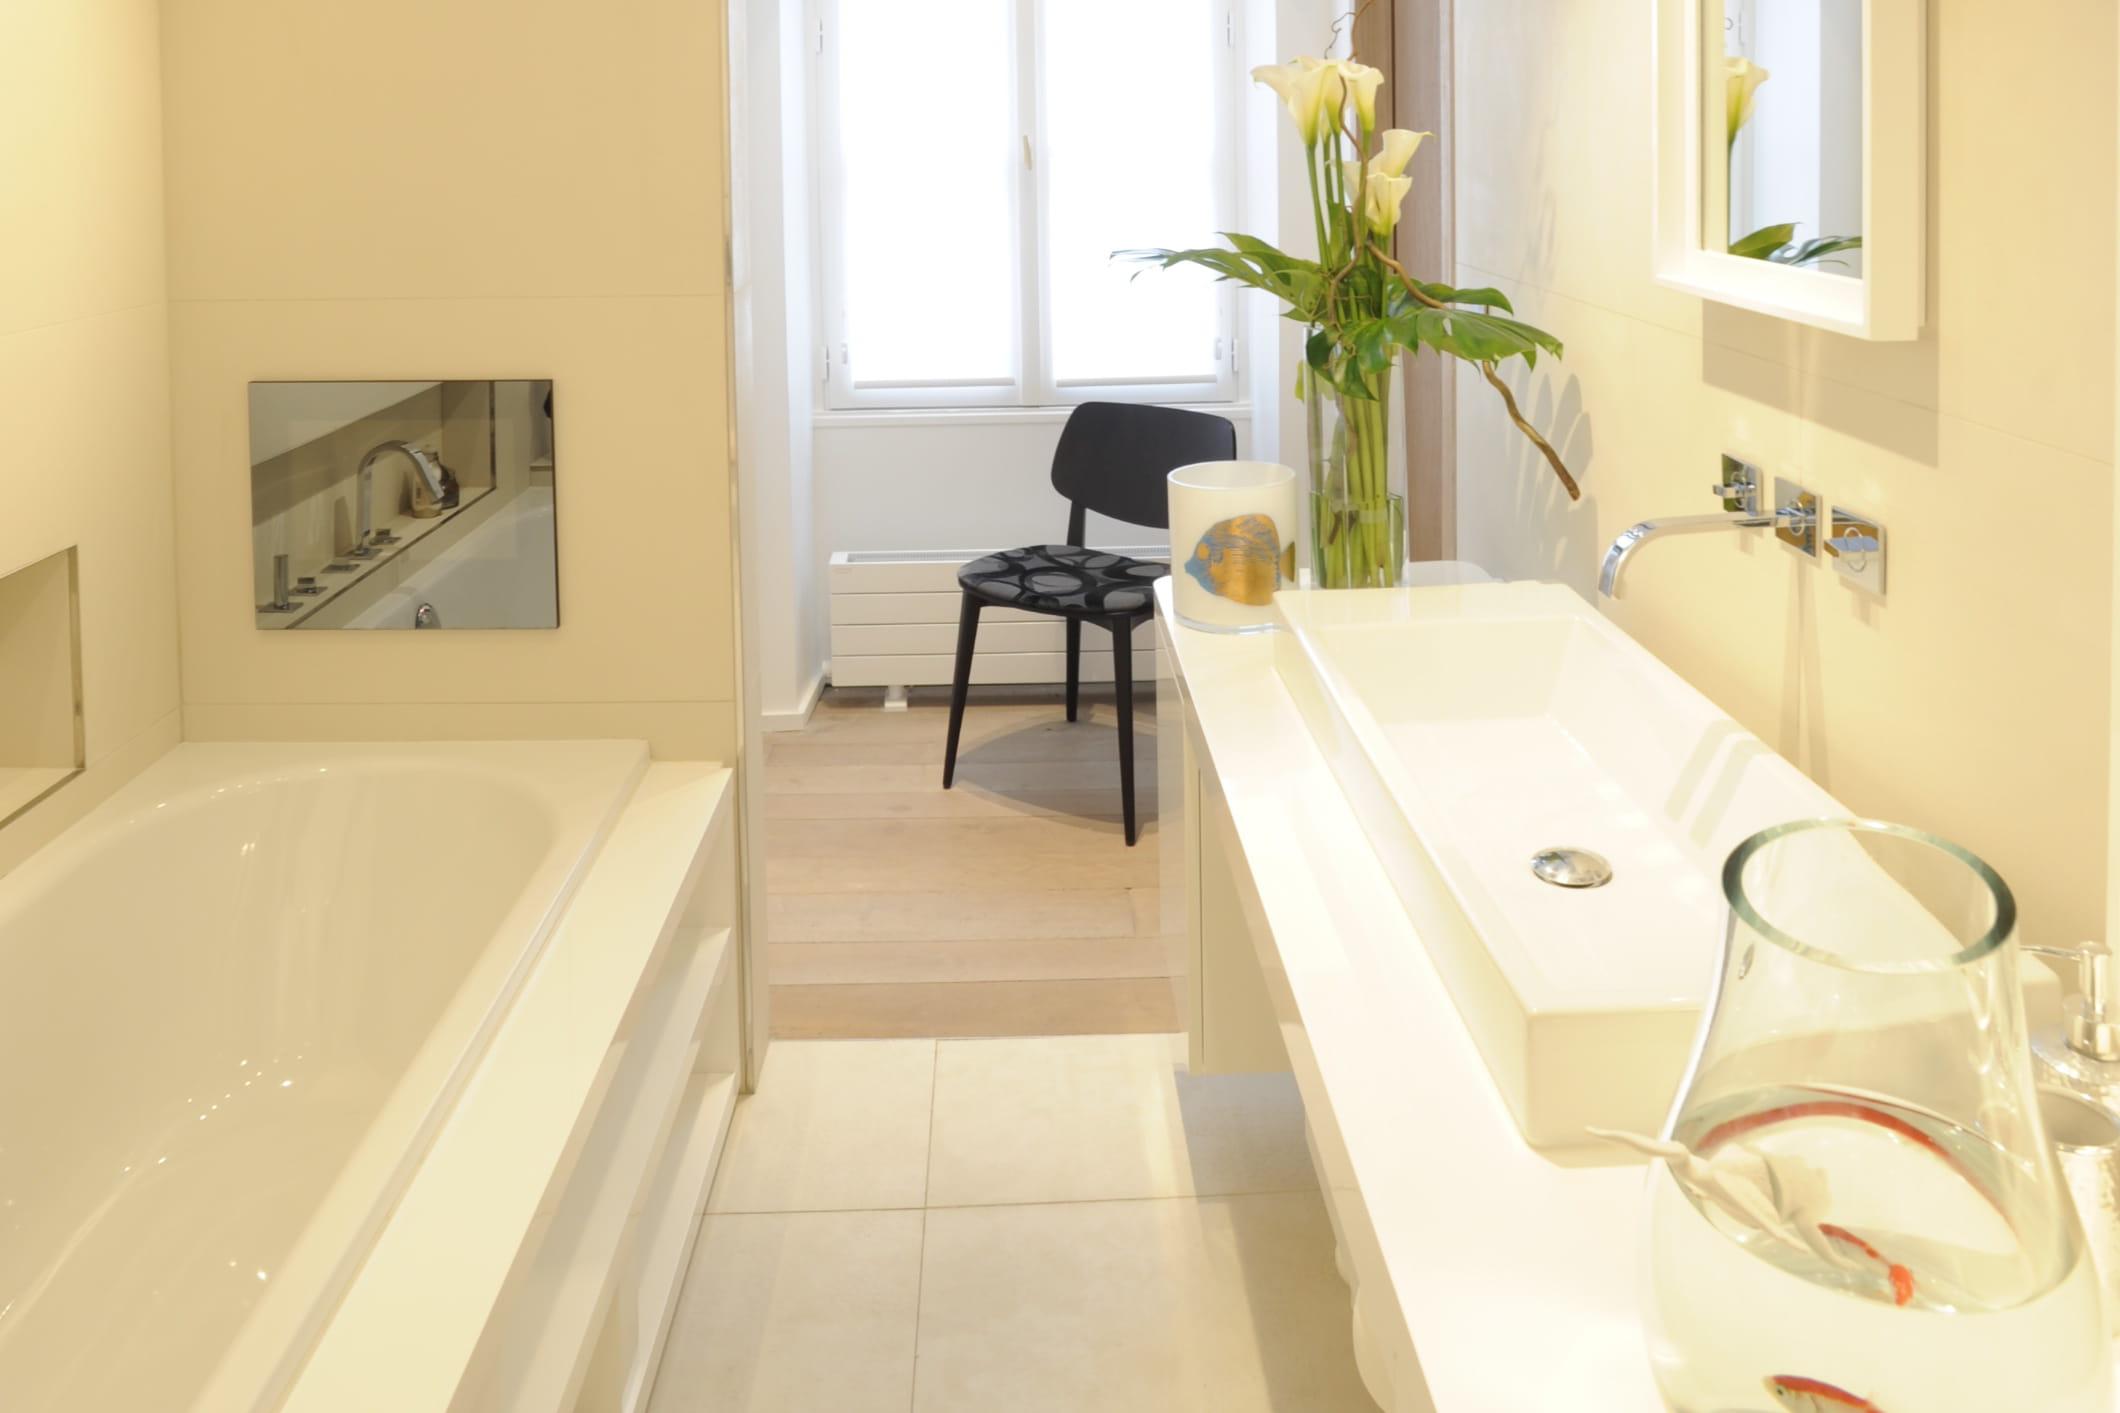 Echelle salle de bain blanche – lombards